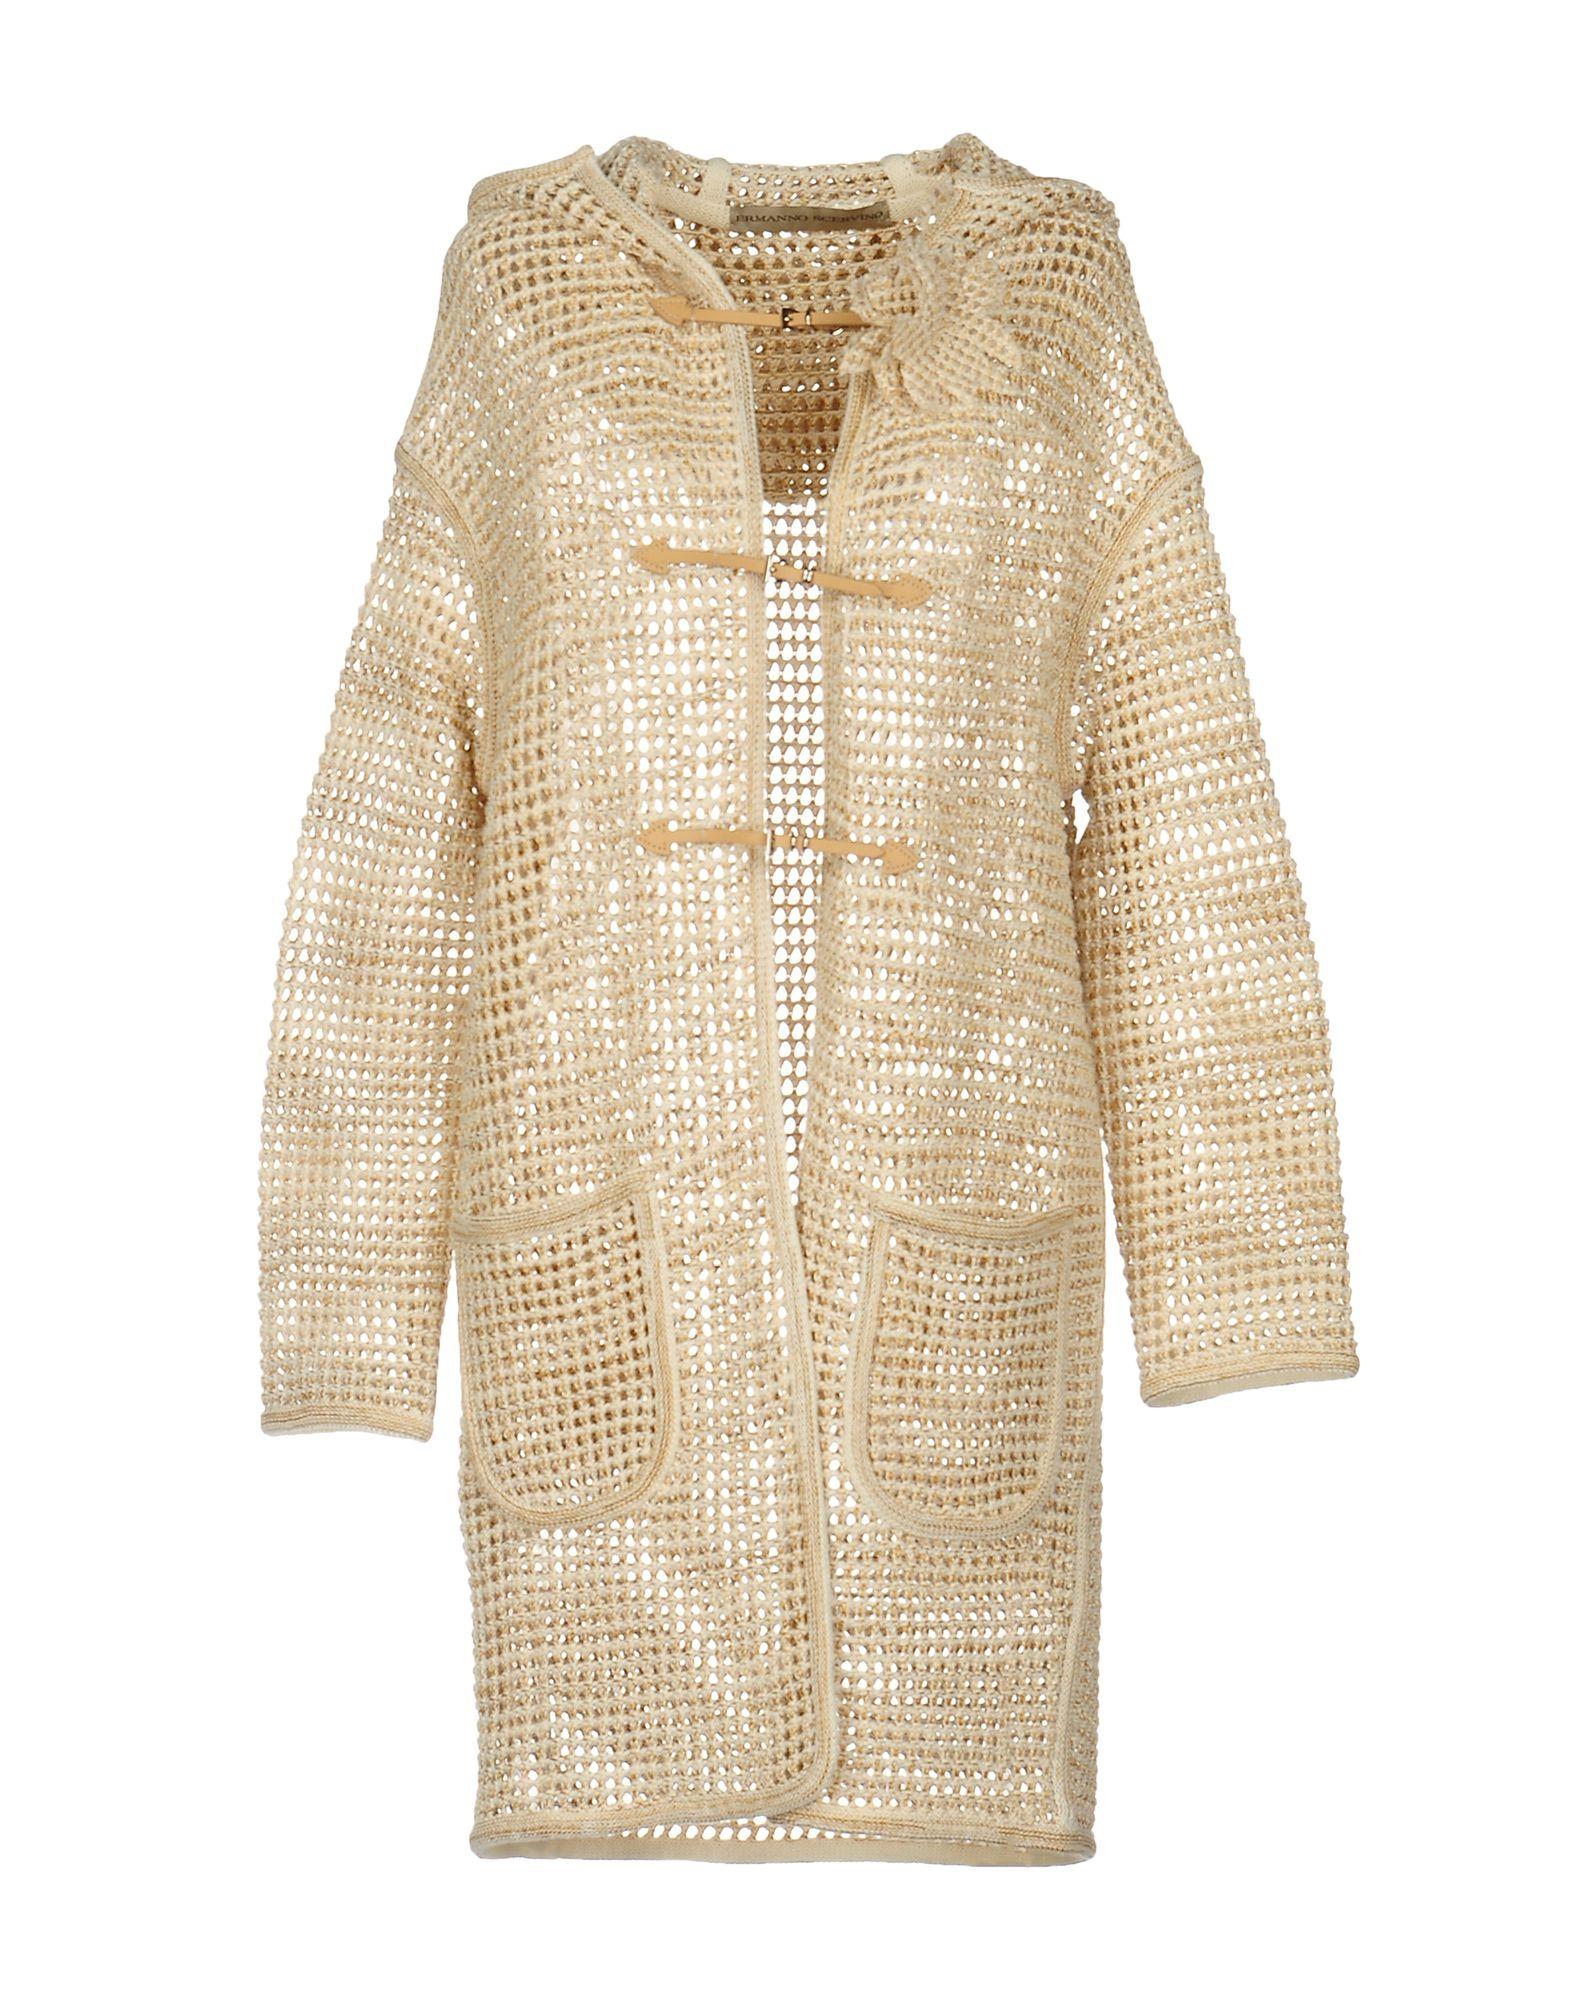 ERMANNO SCERVINO Легкое пальто пальто зима кожаные рукава цена